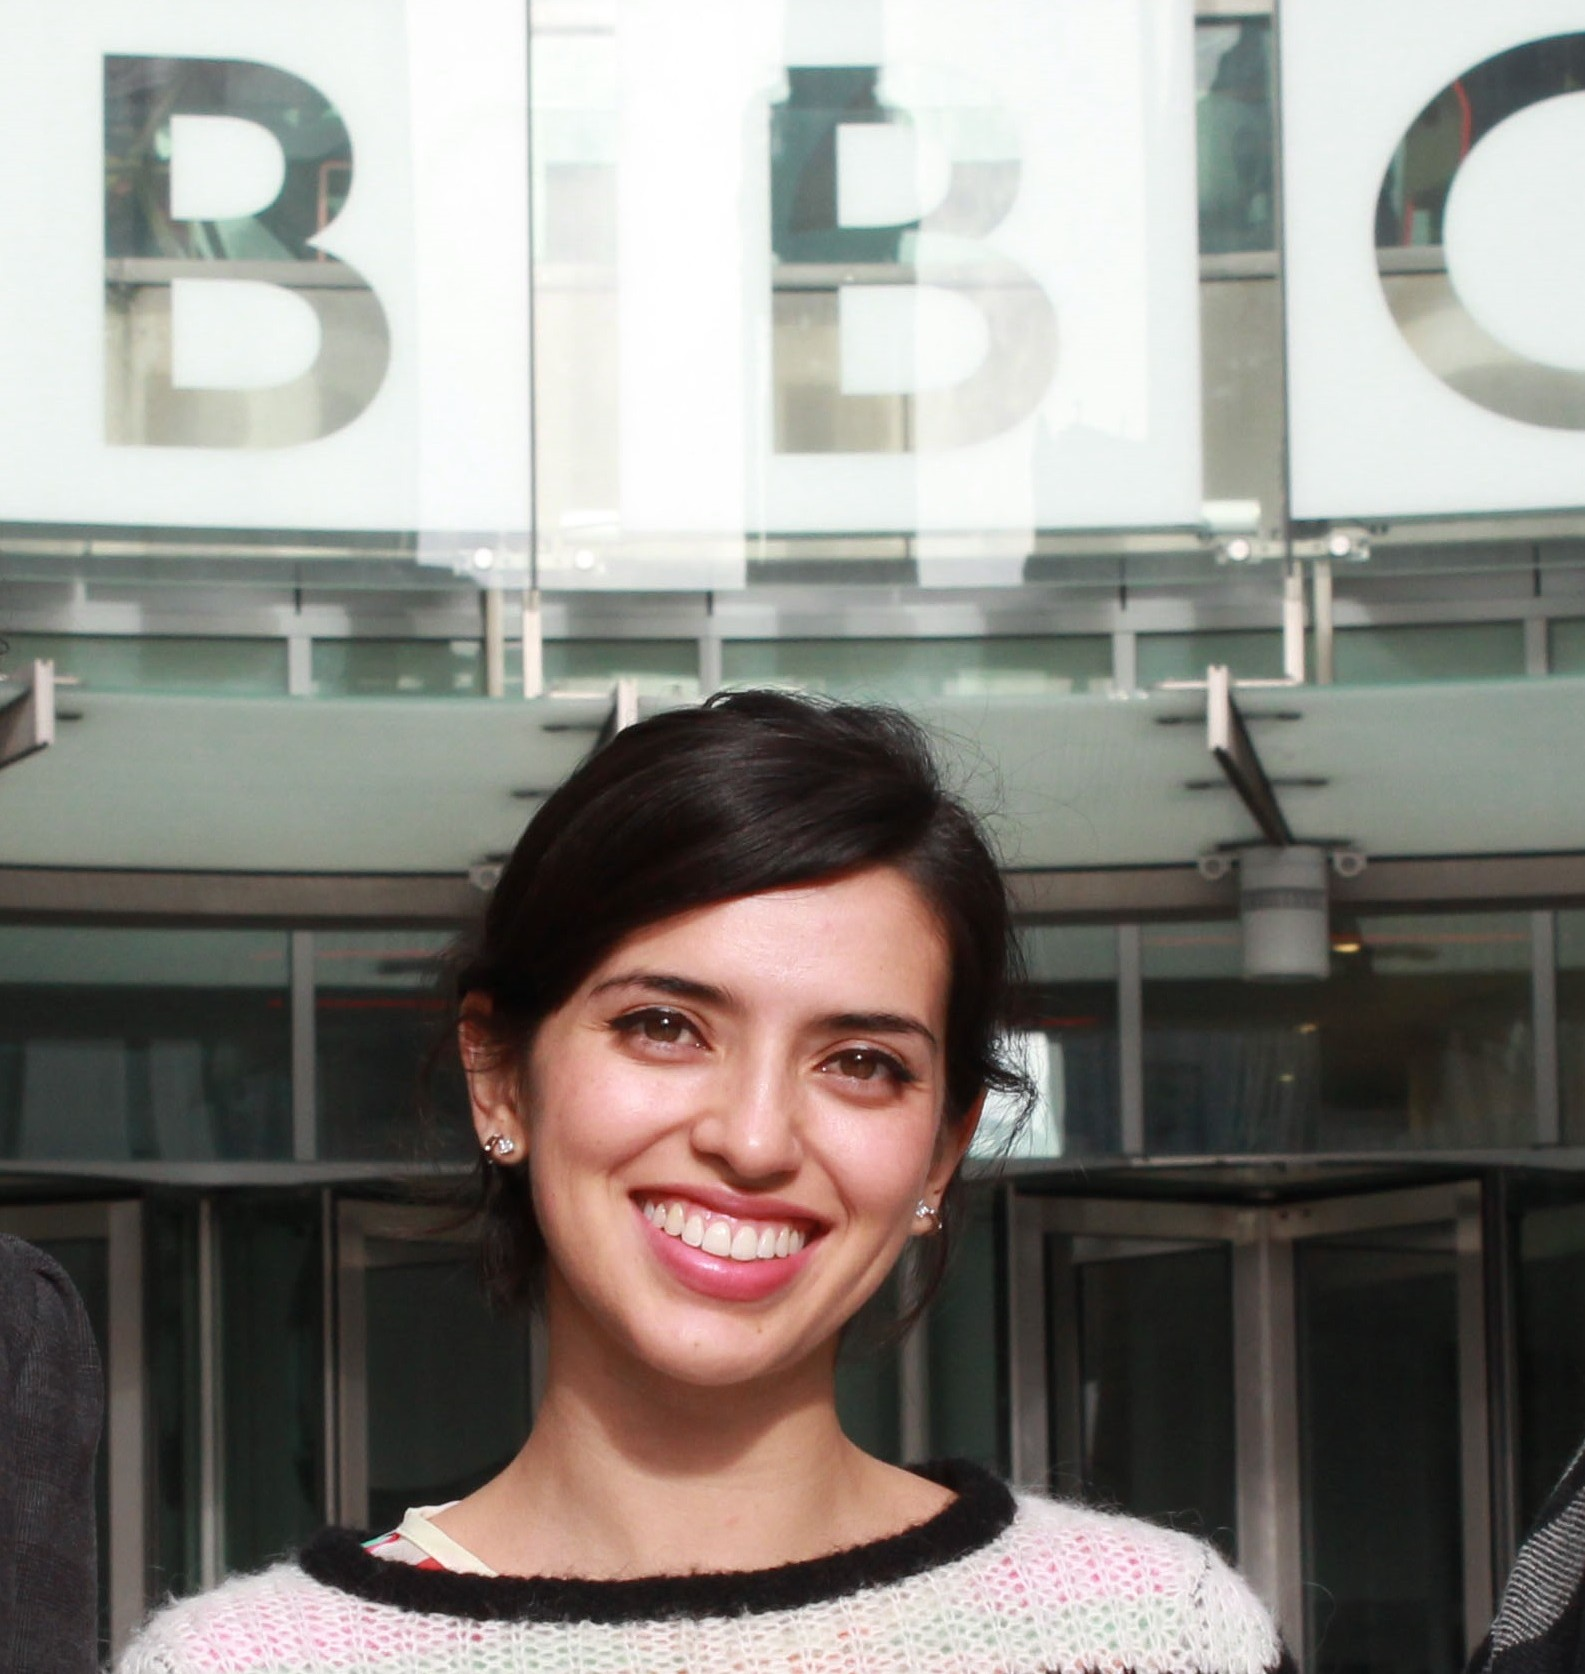 Ana © Hannah Robins/BBC